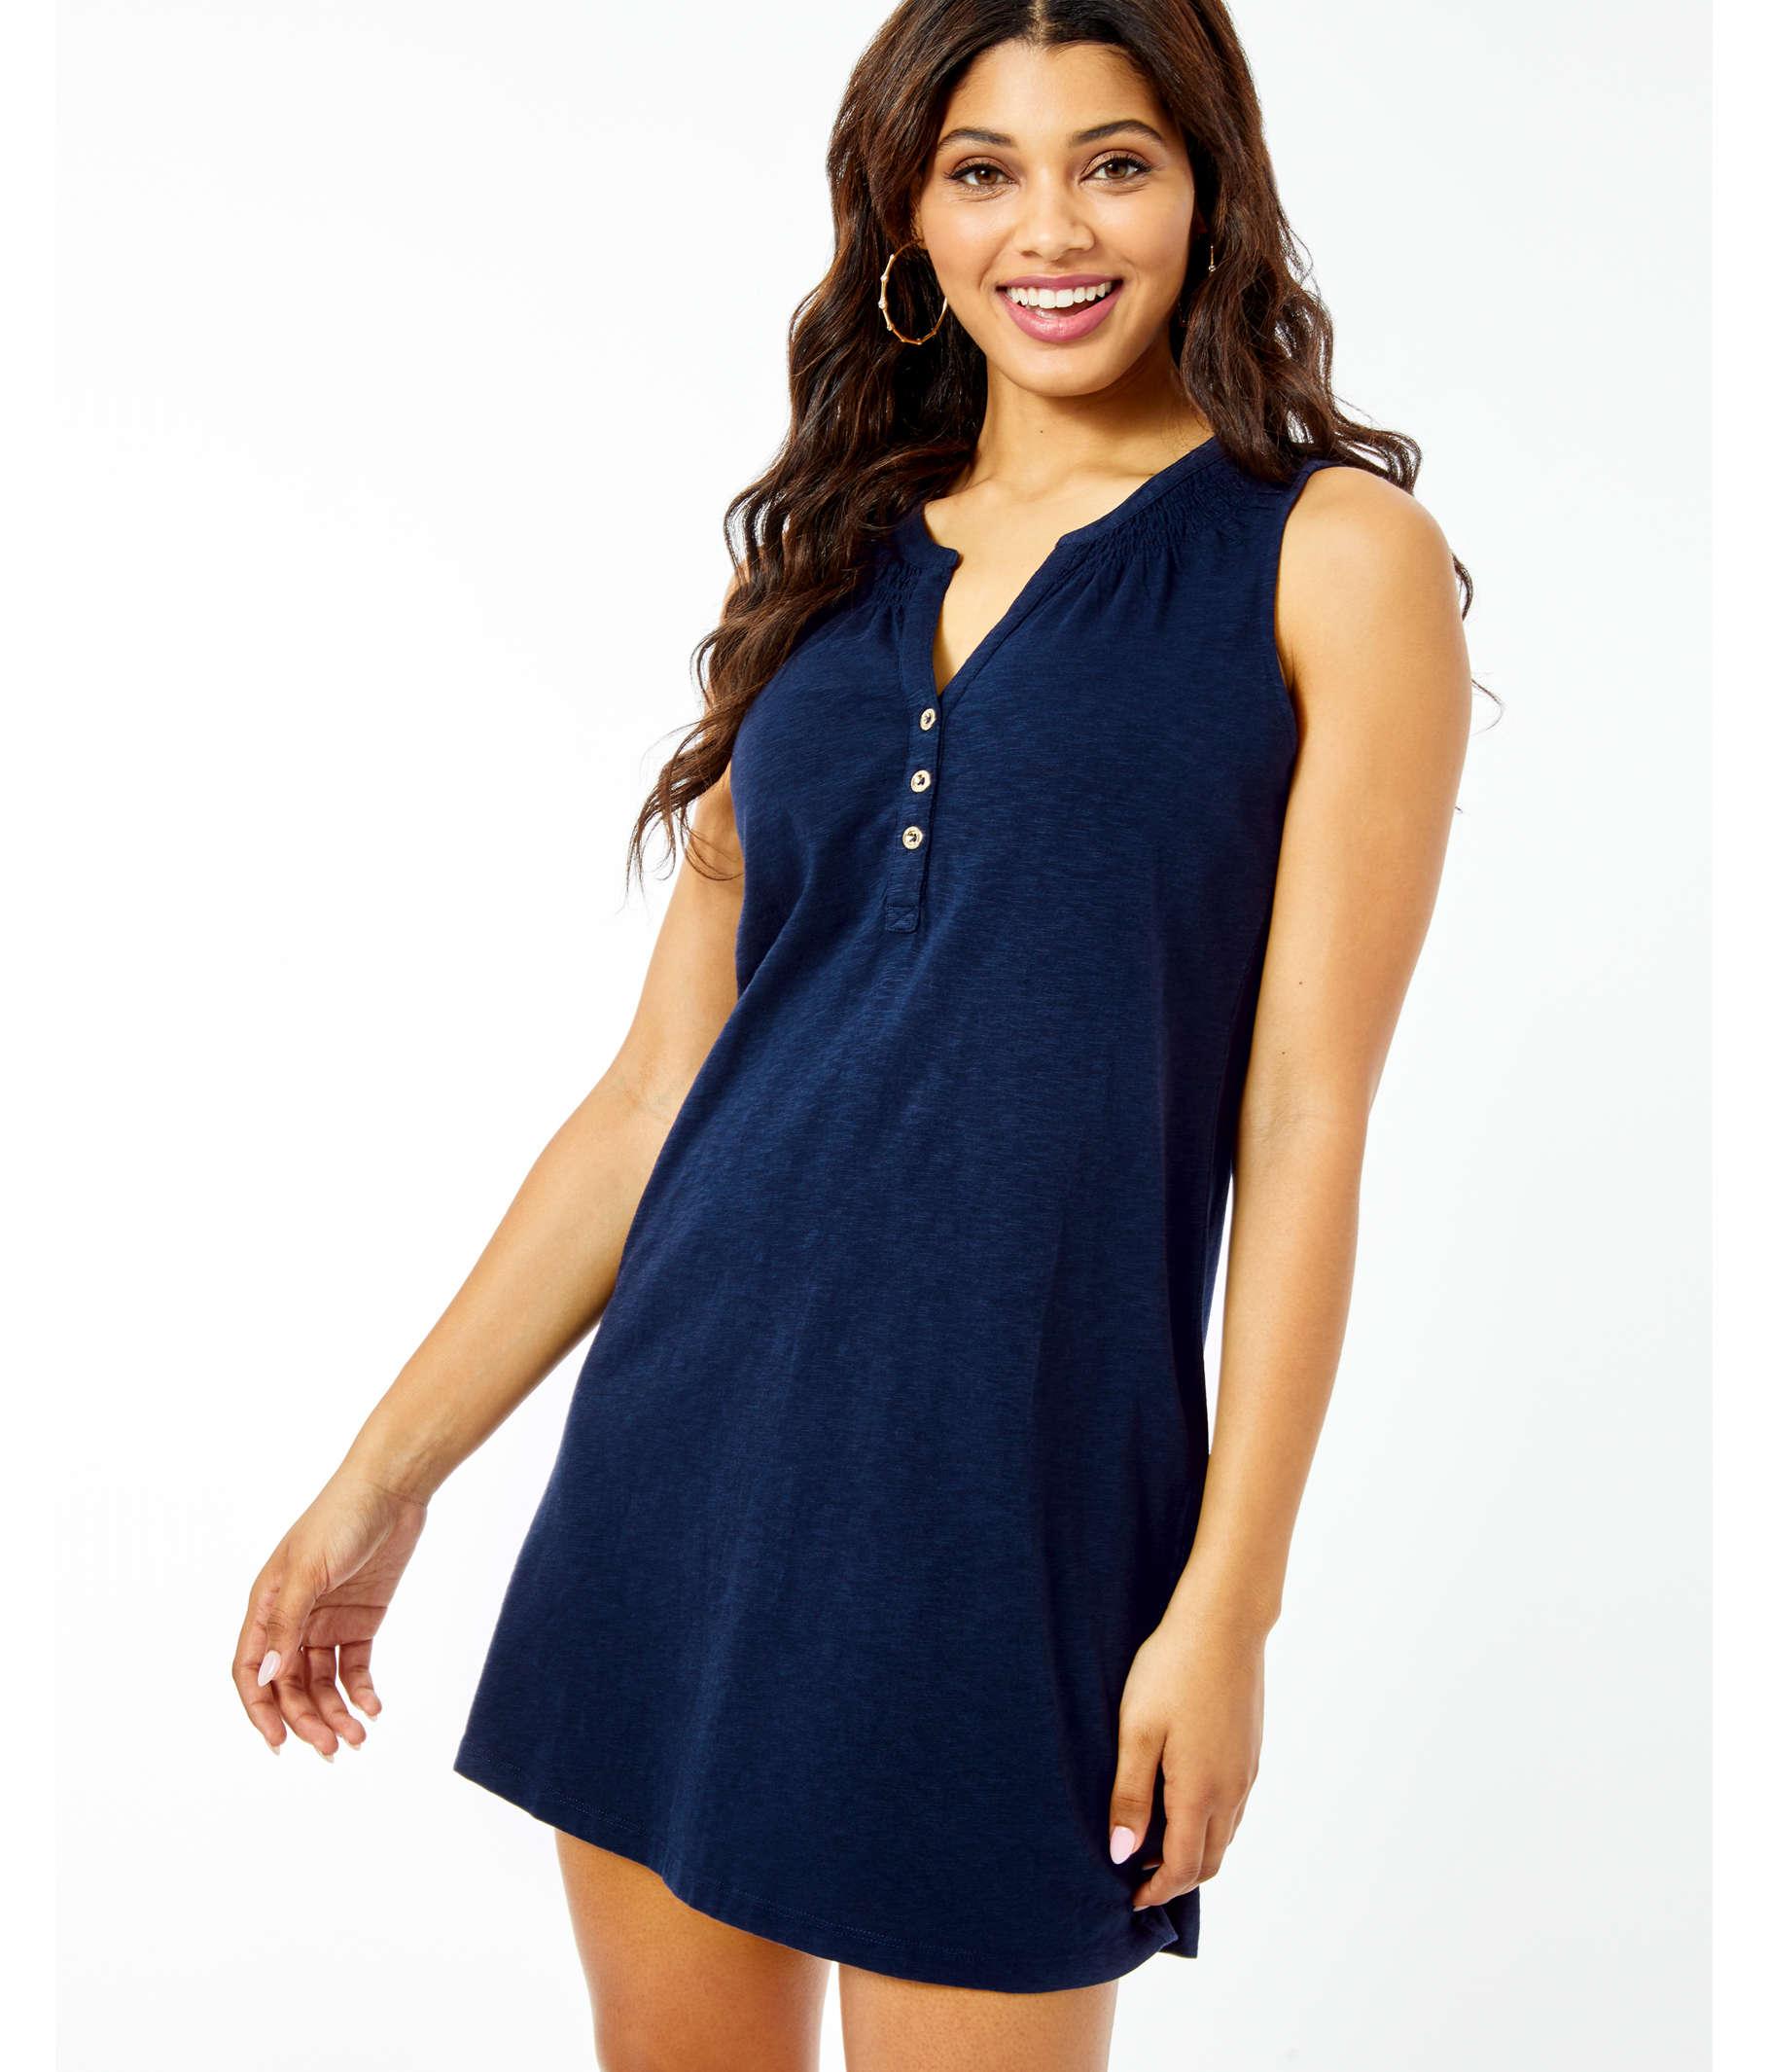 69cd35d3ec ... Sleeveless Essie Dress